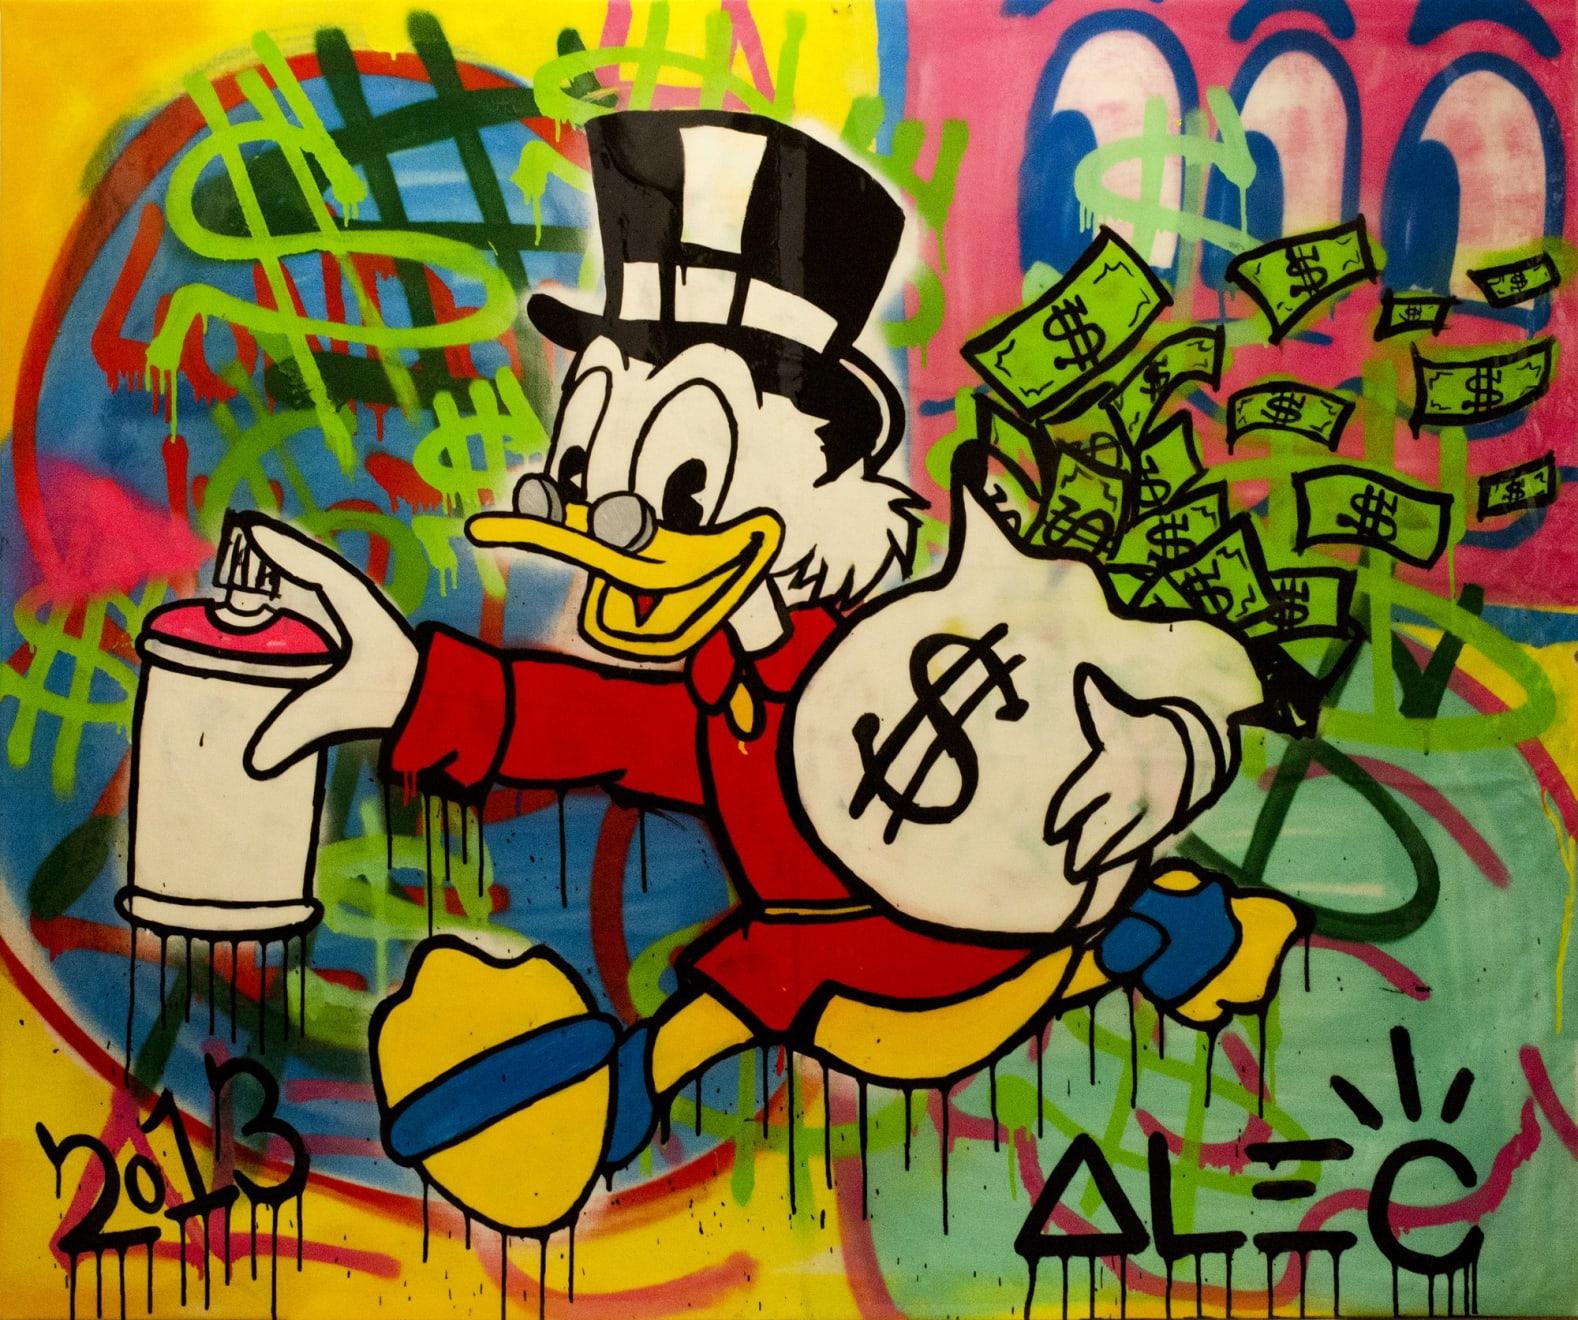 Alec Monopoly Run Donald Run, 2013